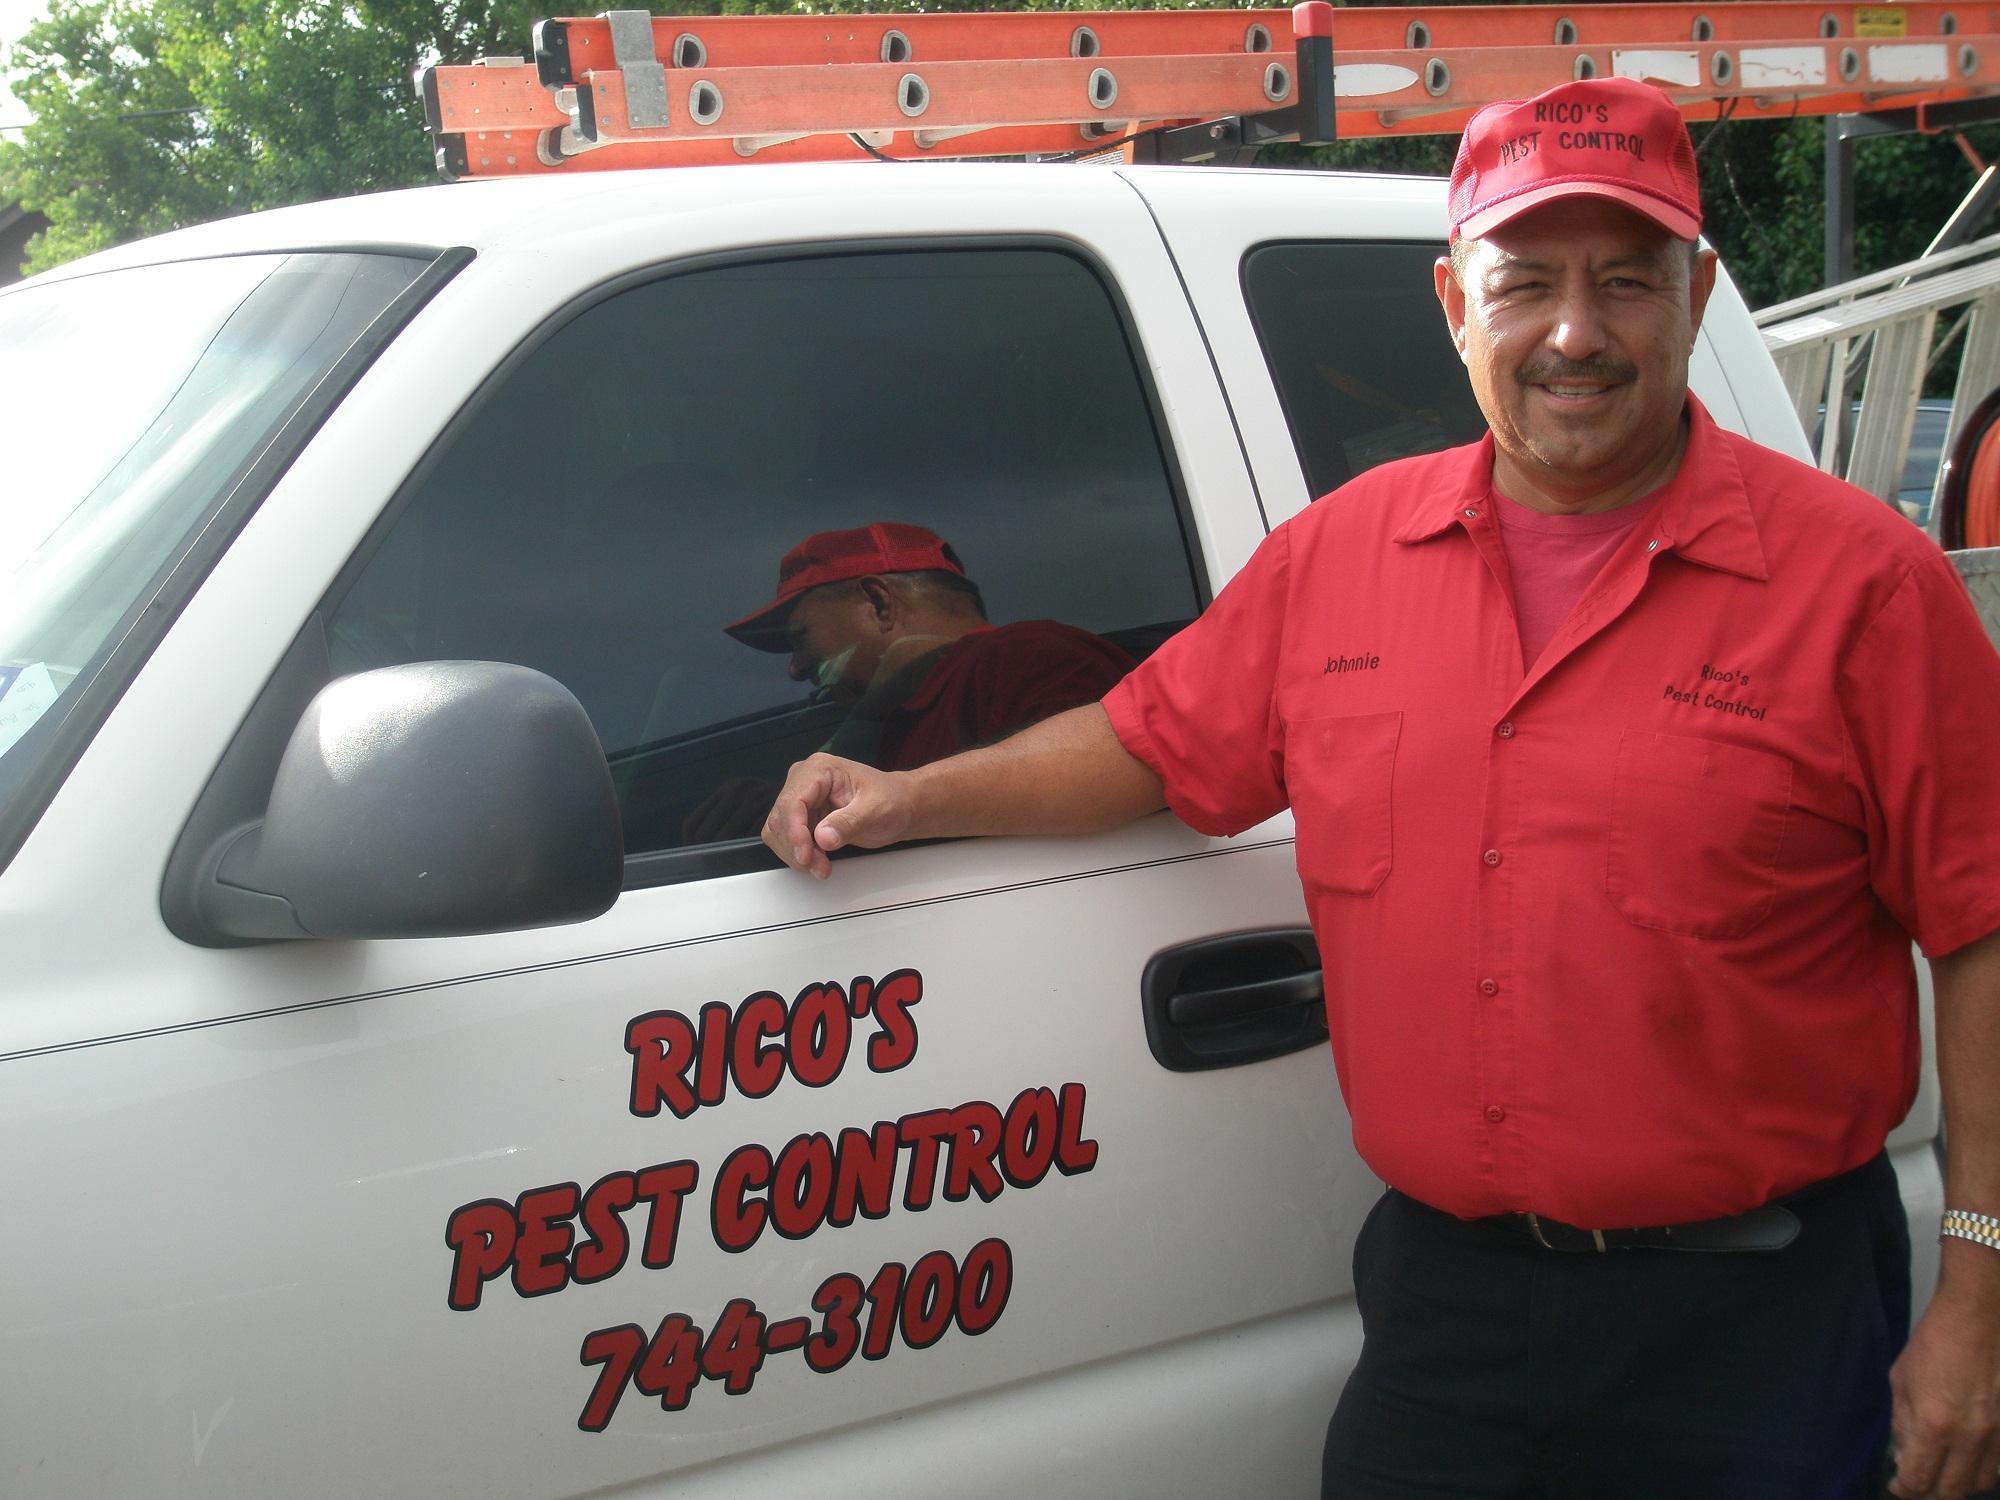 Rico's Pest Control image 5